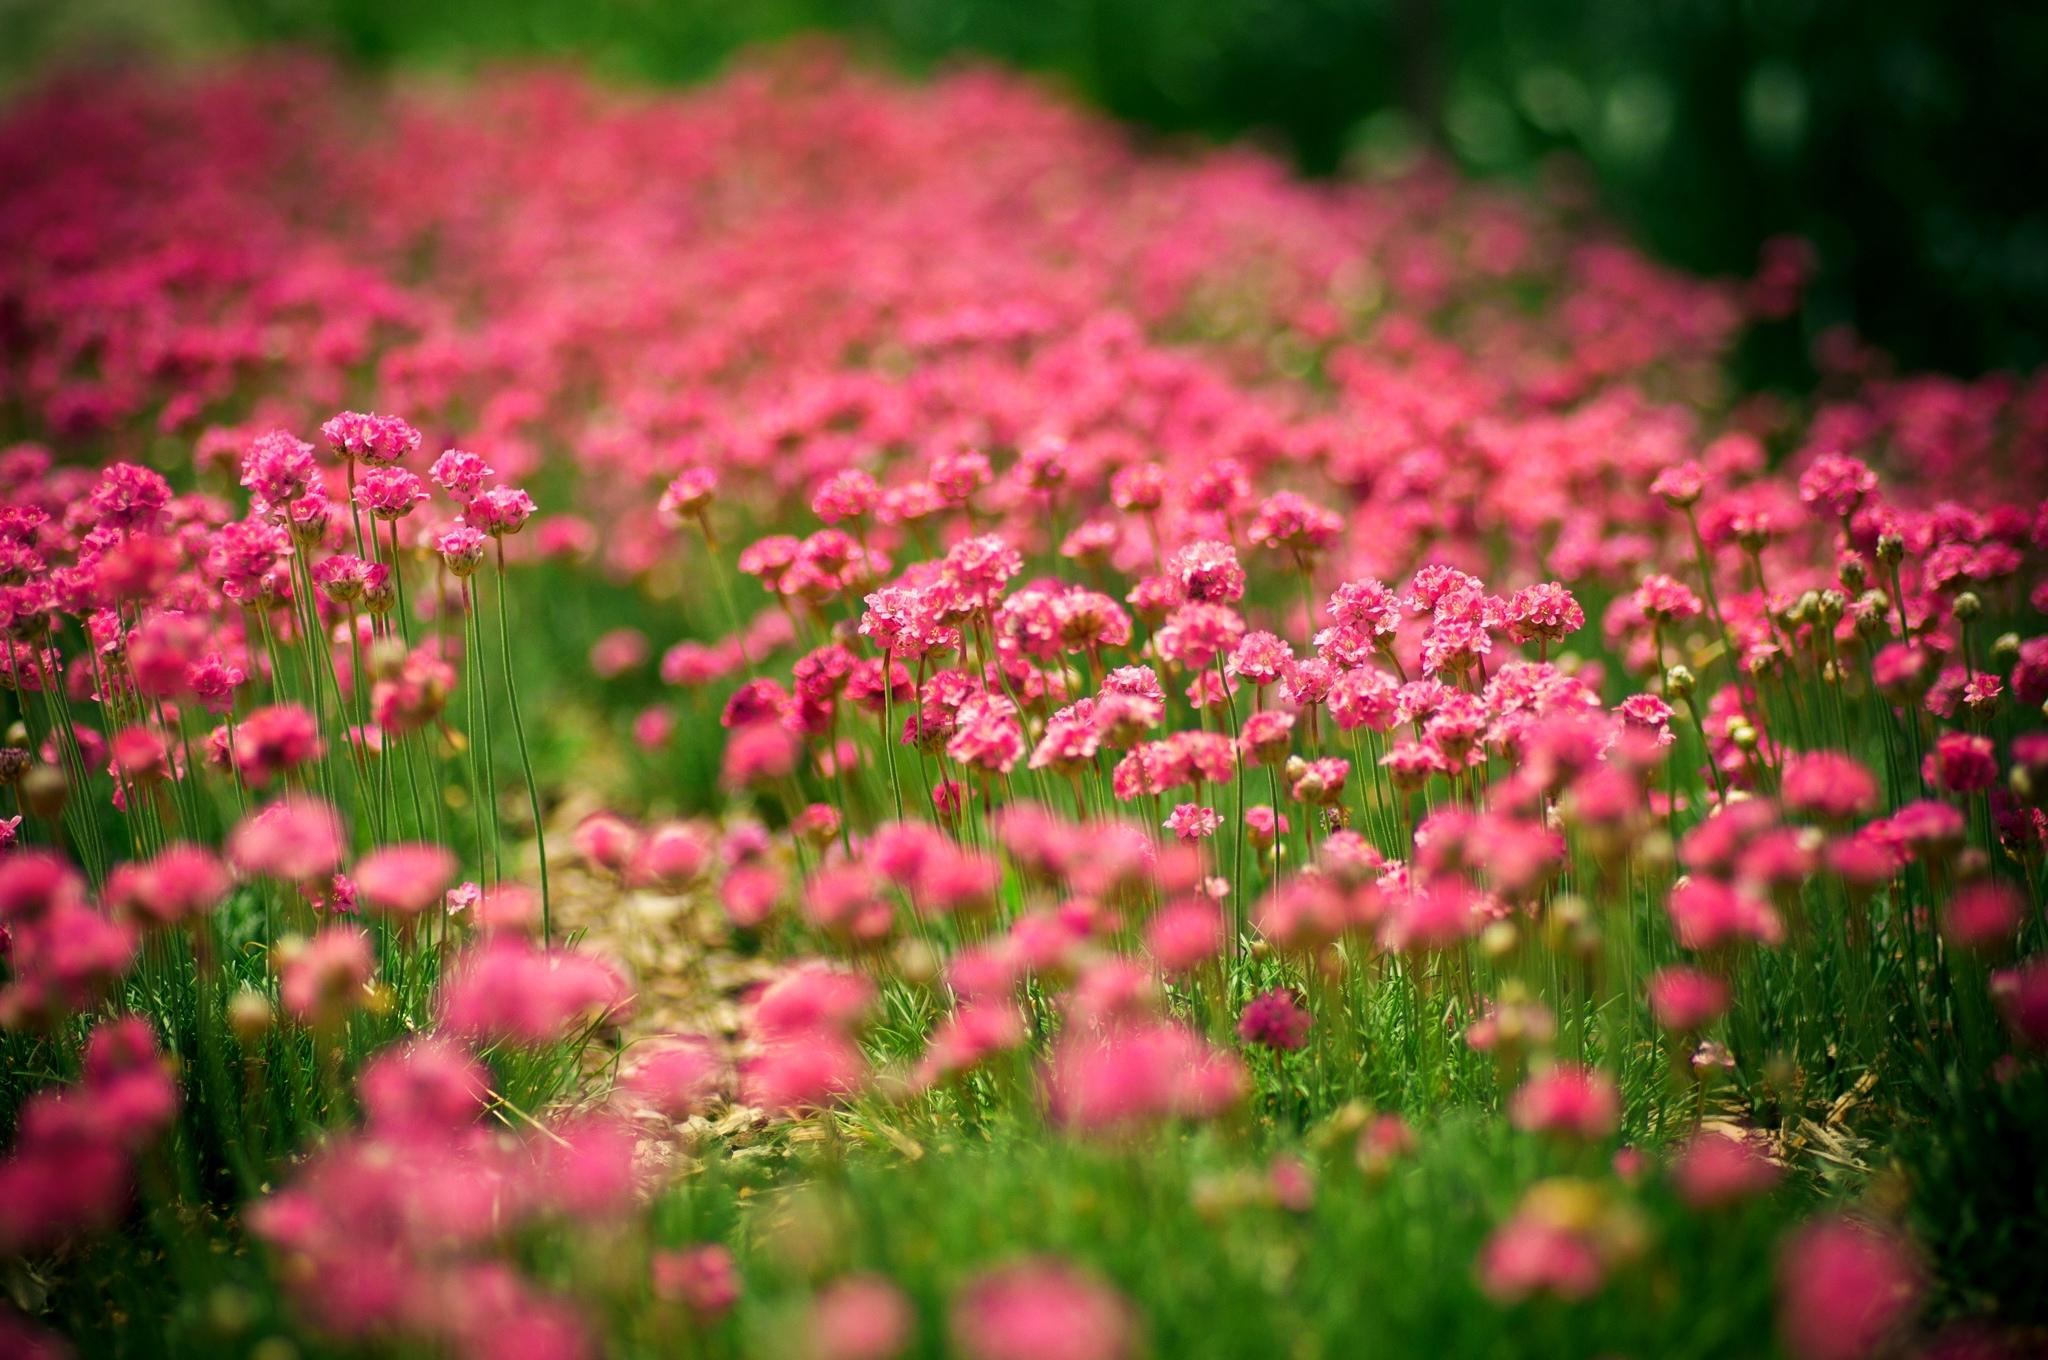 розово-фиолетовая поляна без смс